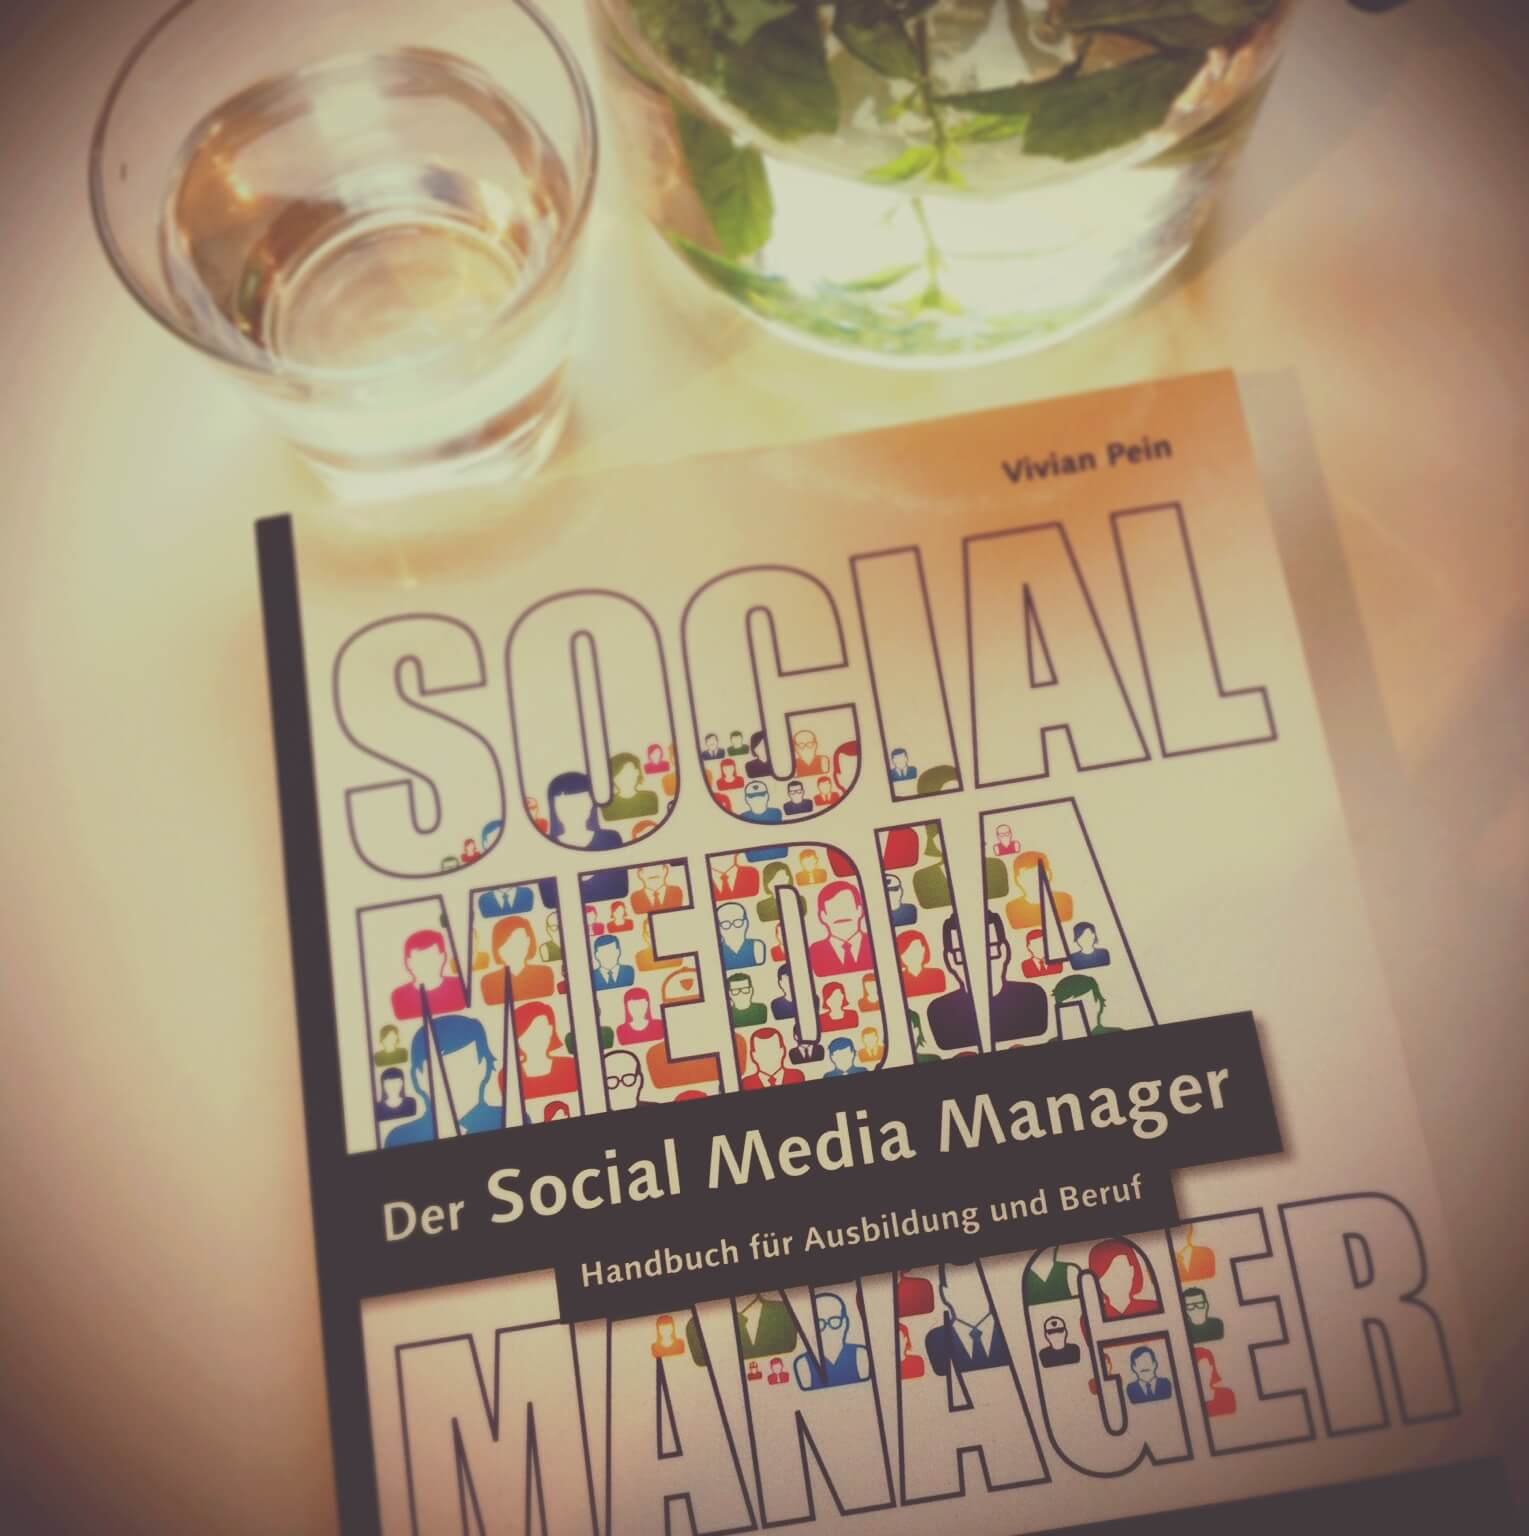 Lesetipp für Social Media Manager